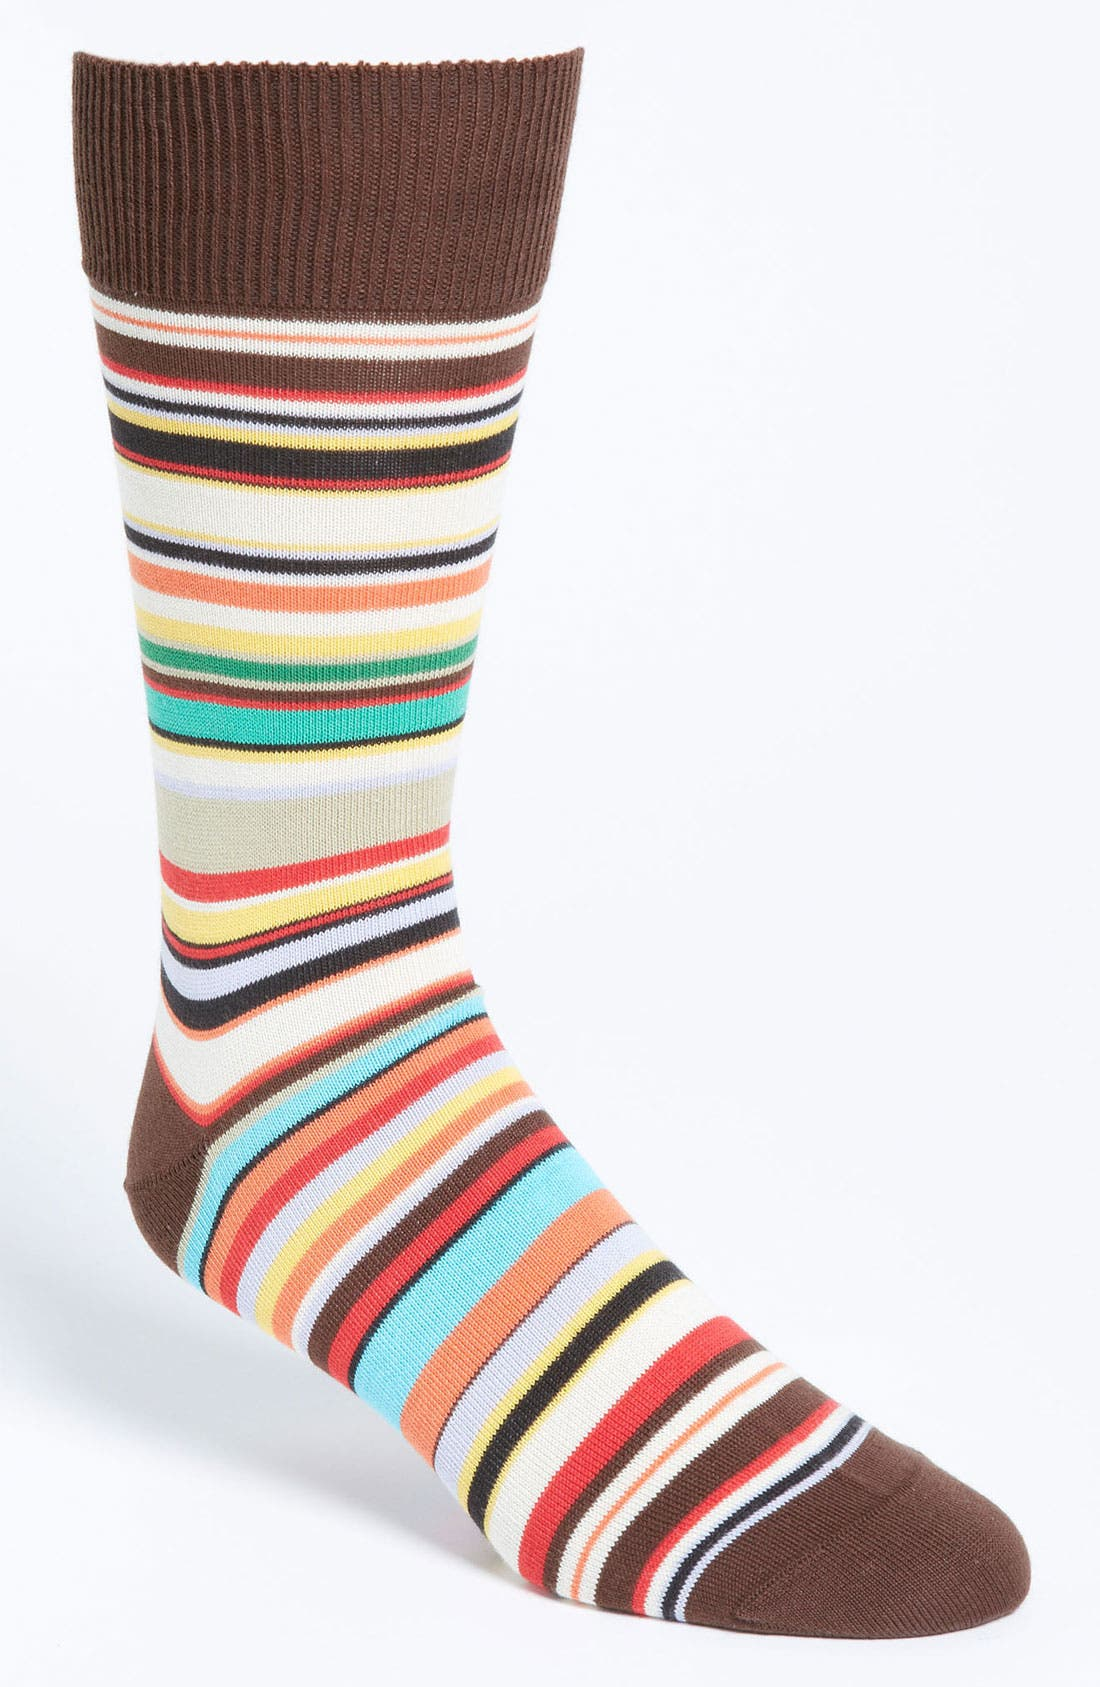 Alternate Image 1 Selected - Paul Smith Accessories Multi Stripe Socks